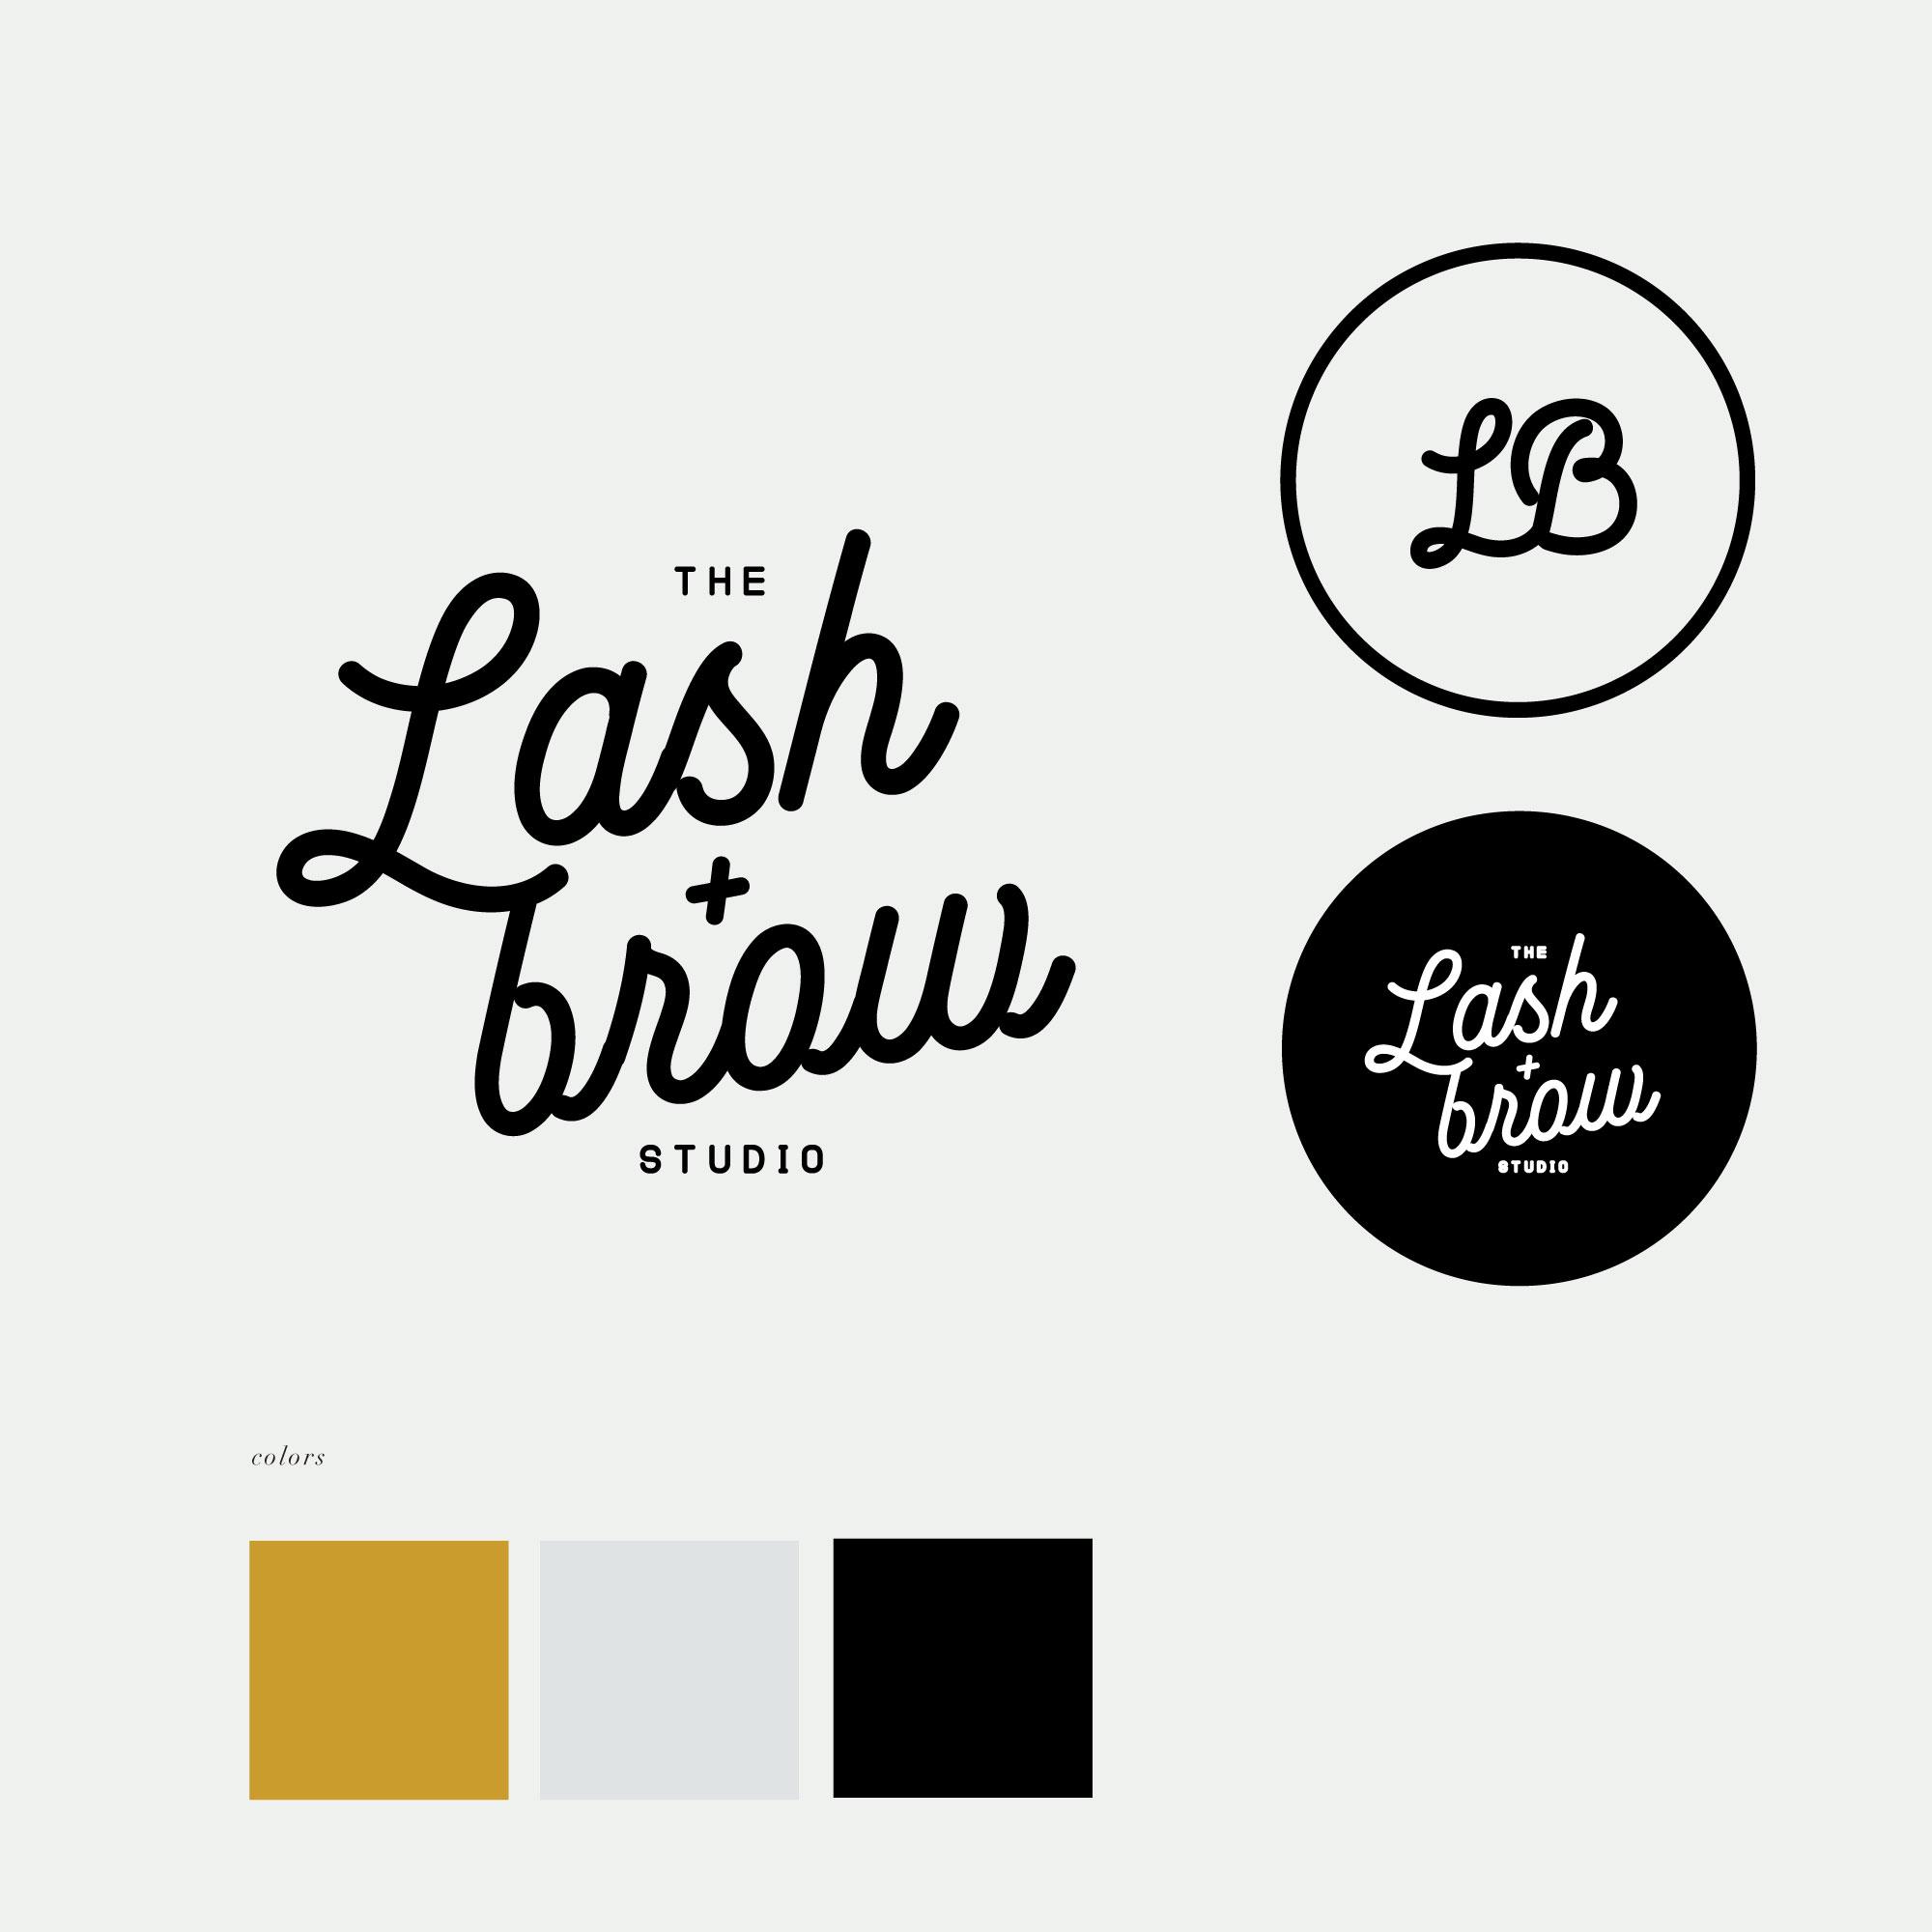 The-Lash-and-Brow-Studio-logo-proposal-image.jpg